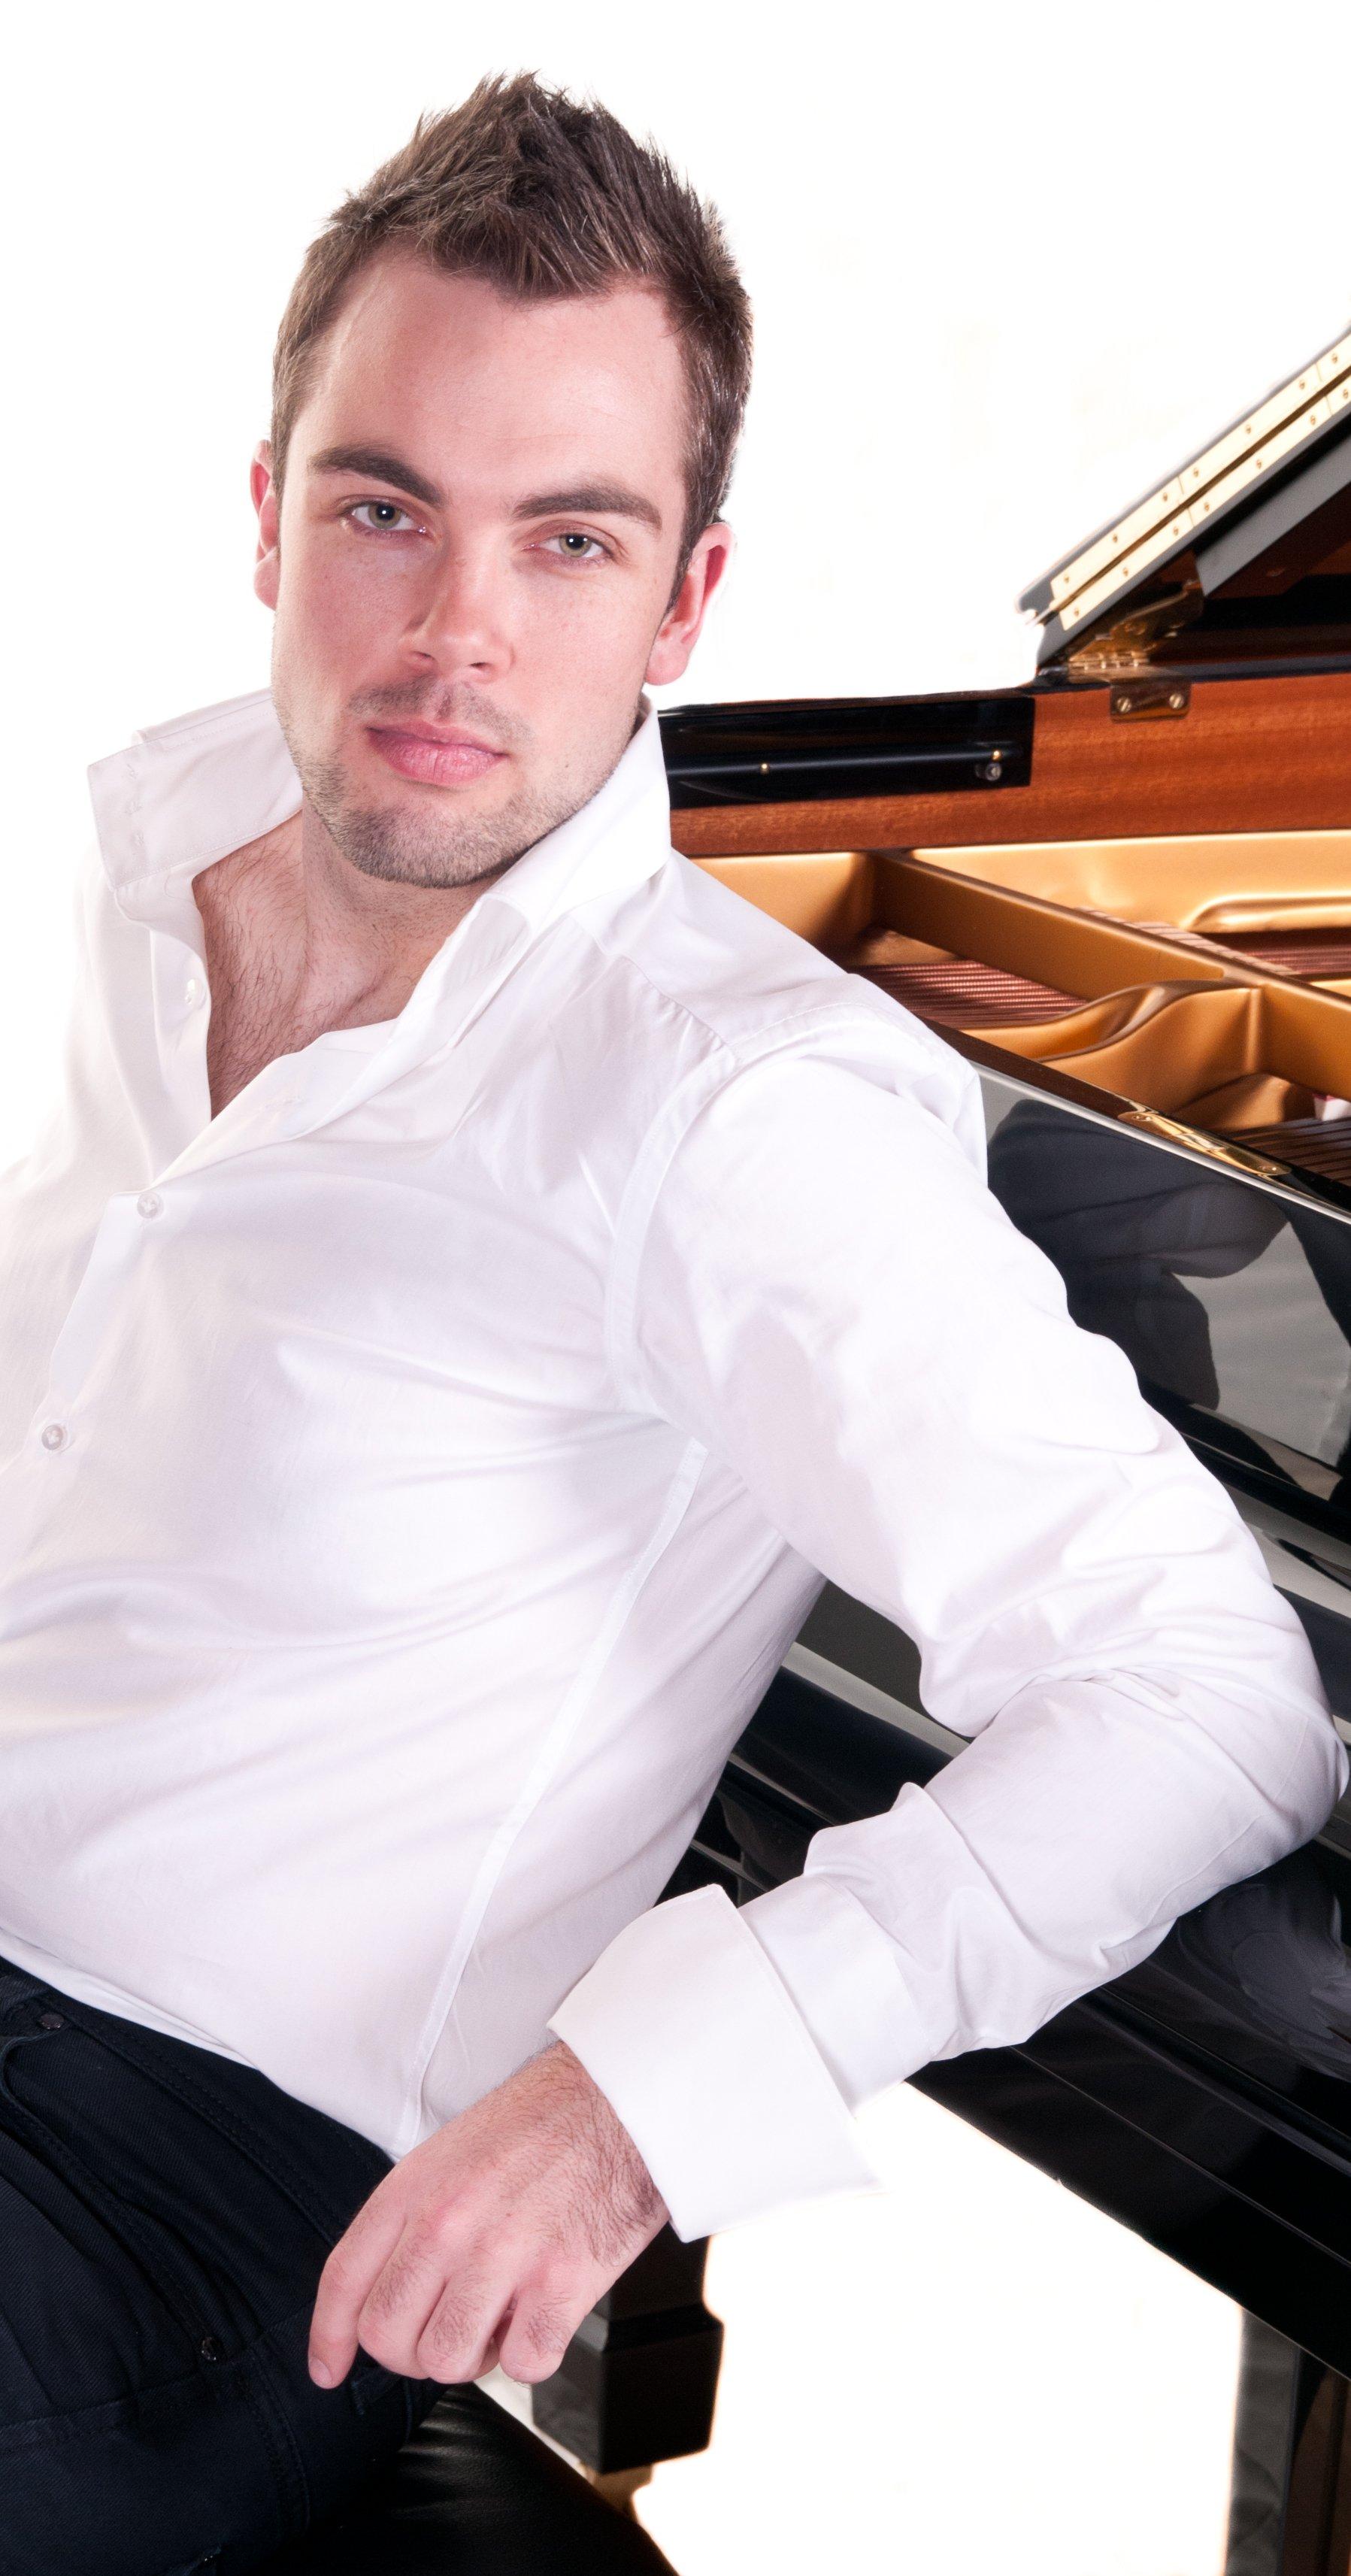 One-handed pianist Nicholas McCarthy